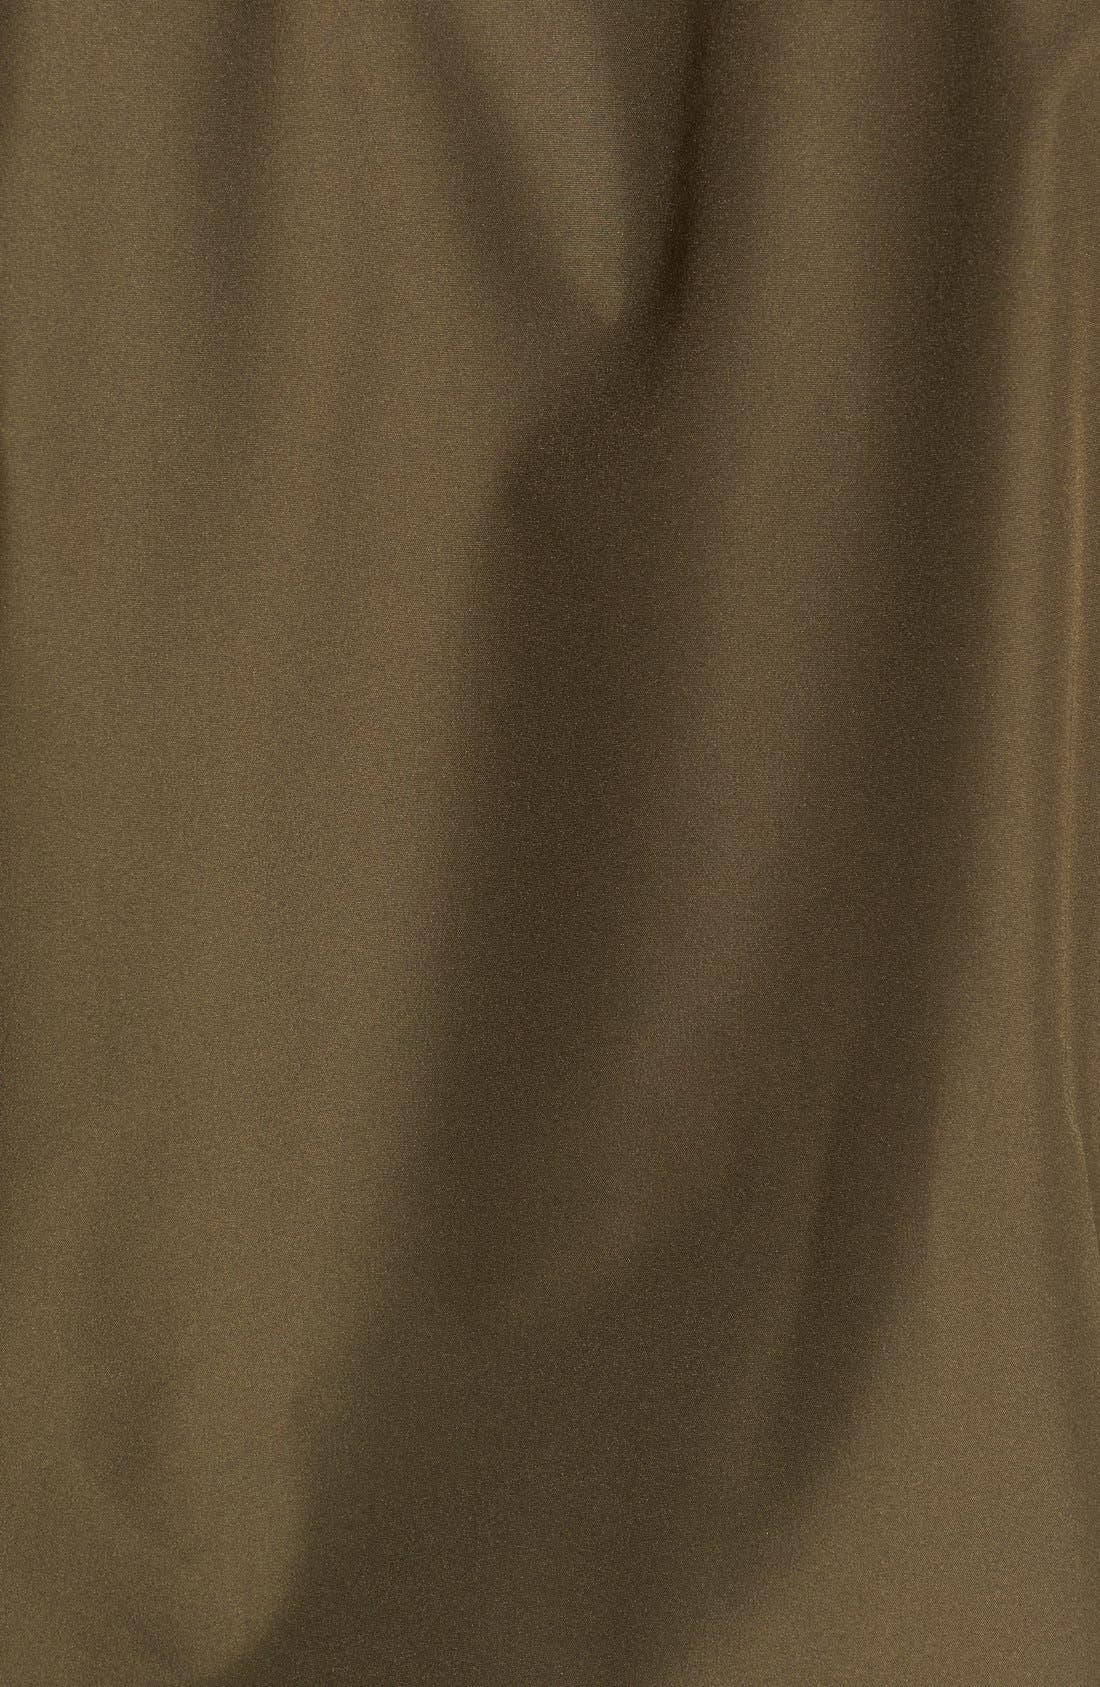 Alternate Image 3  - Helly Hansen 'Dubliner' Waterproof Jacket